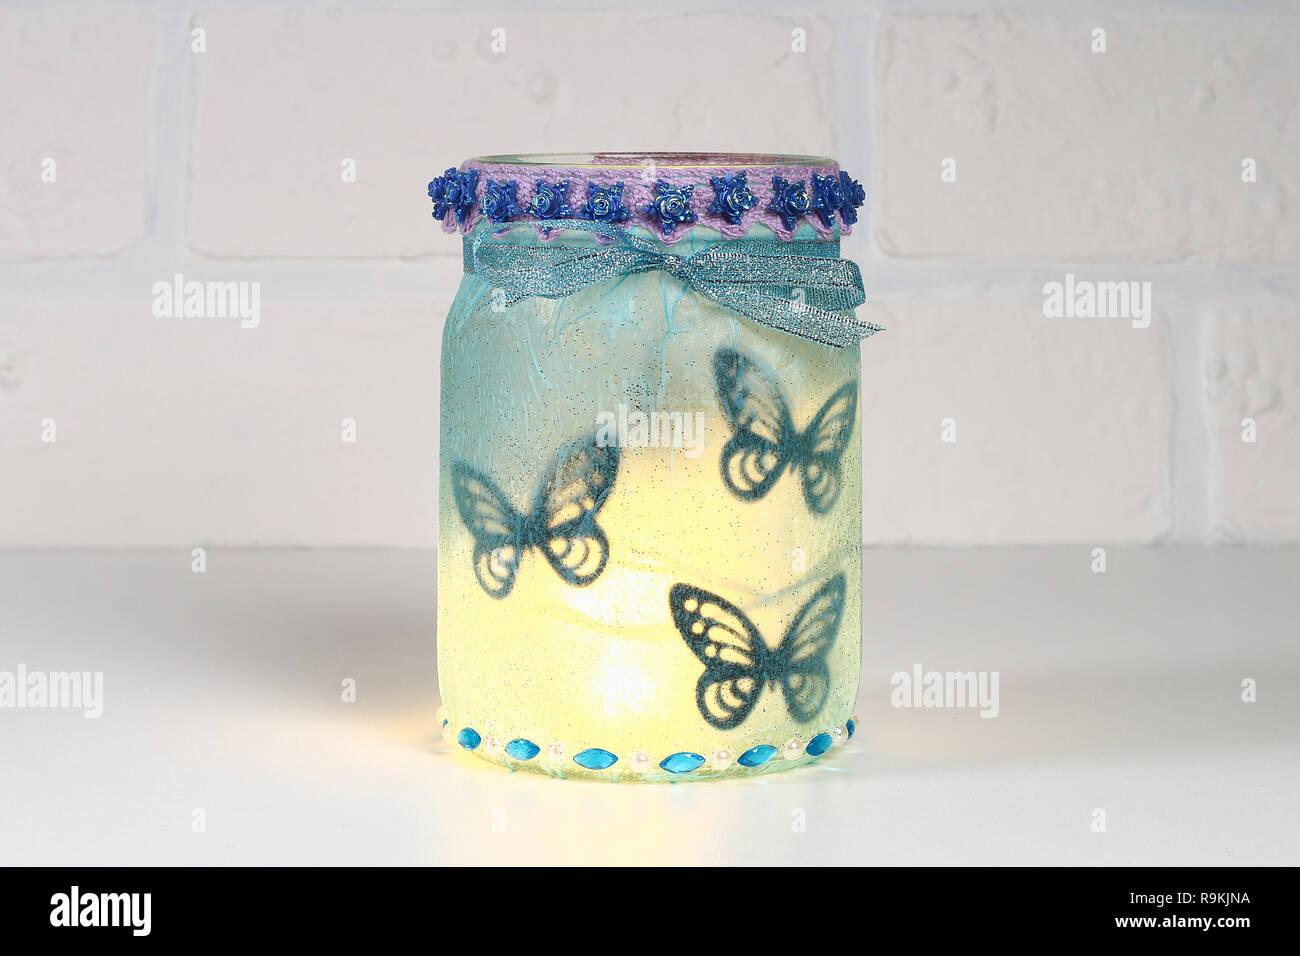 Diy Fairy Jar On White Brick Wall Background Gift Ideas Decor St February 14 Valentines Day Love Wedding Handmade Lamp Night Light Lantern Fro Stock Photo Alamy